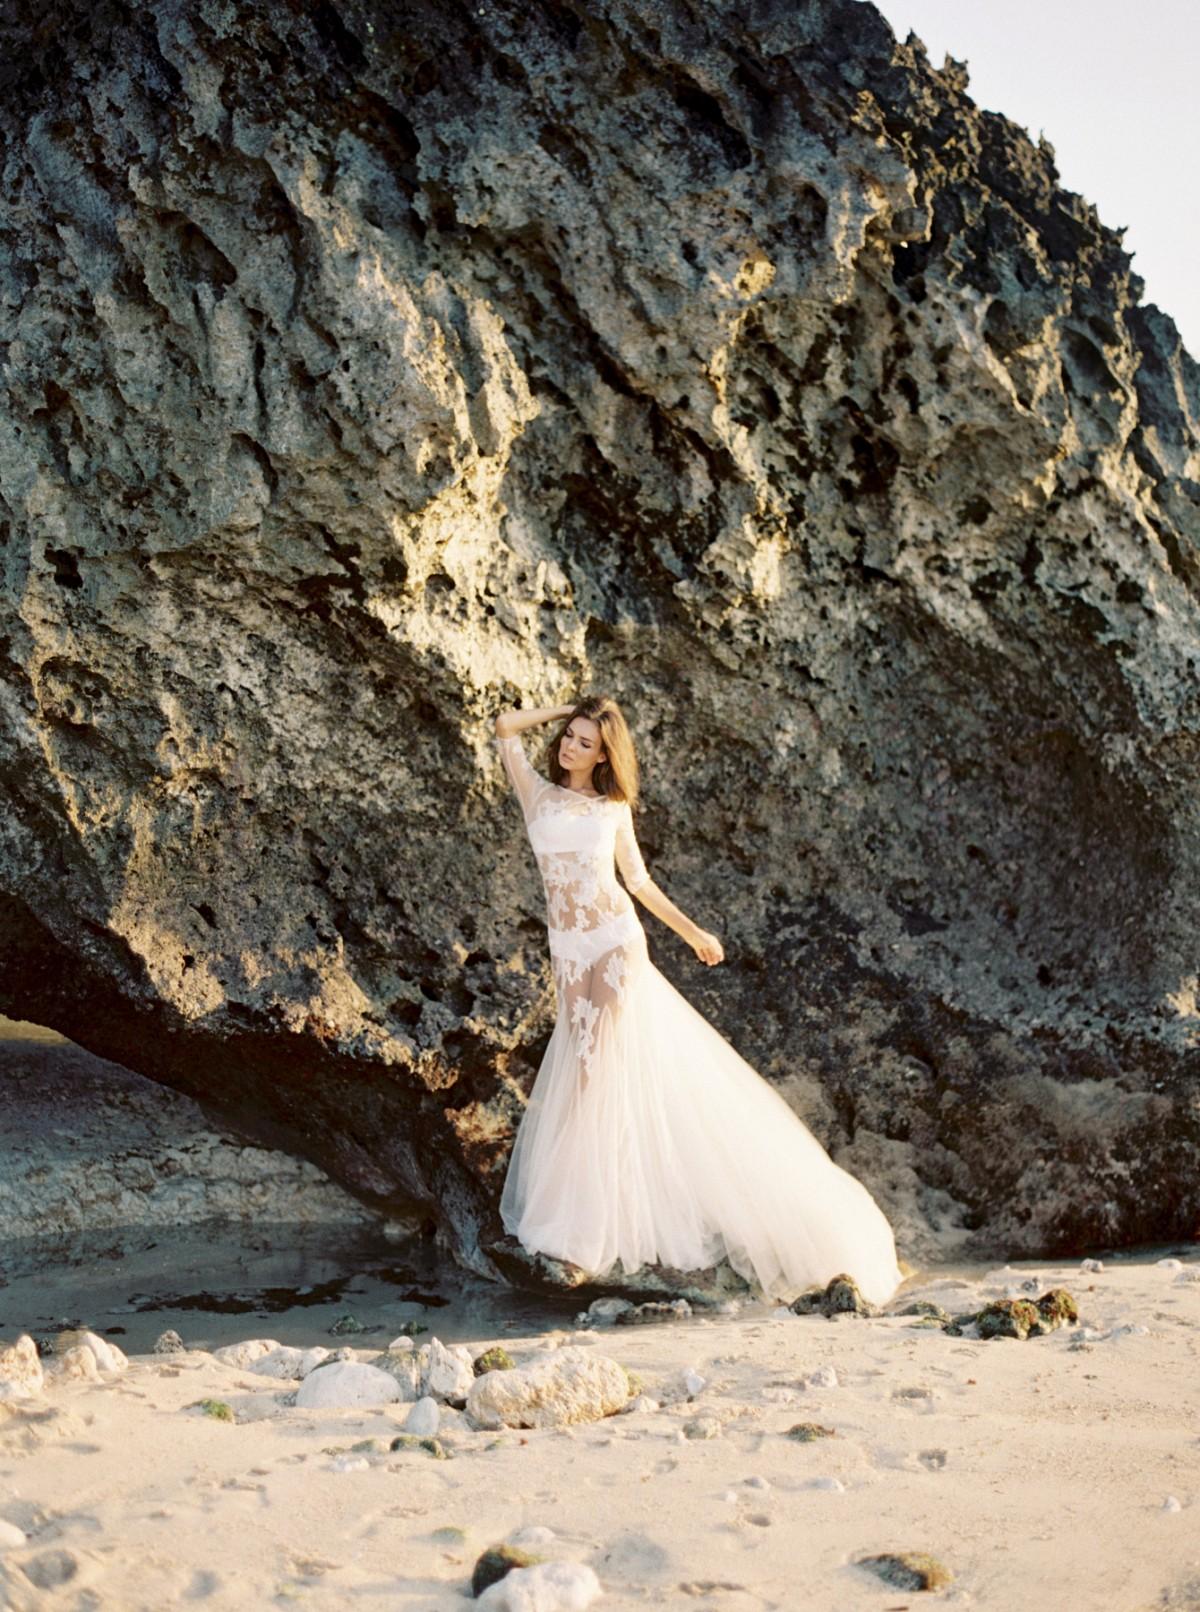 Ethereal Coastal Bridal Style in Bali